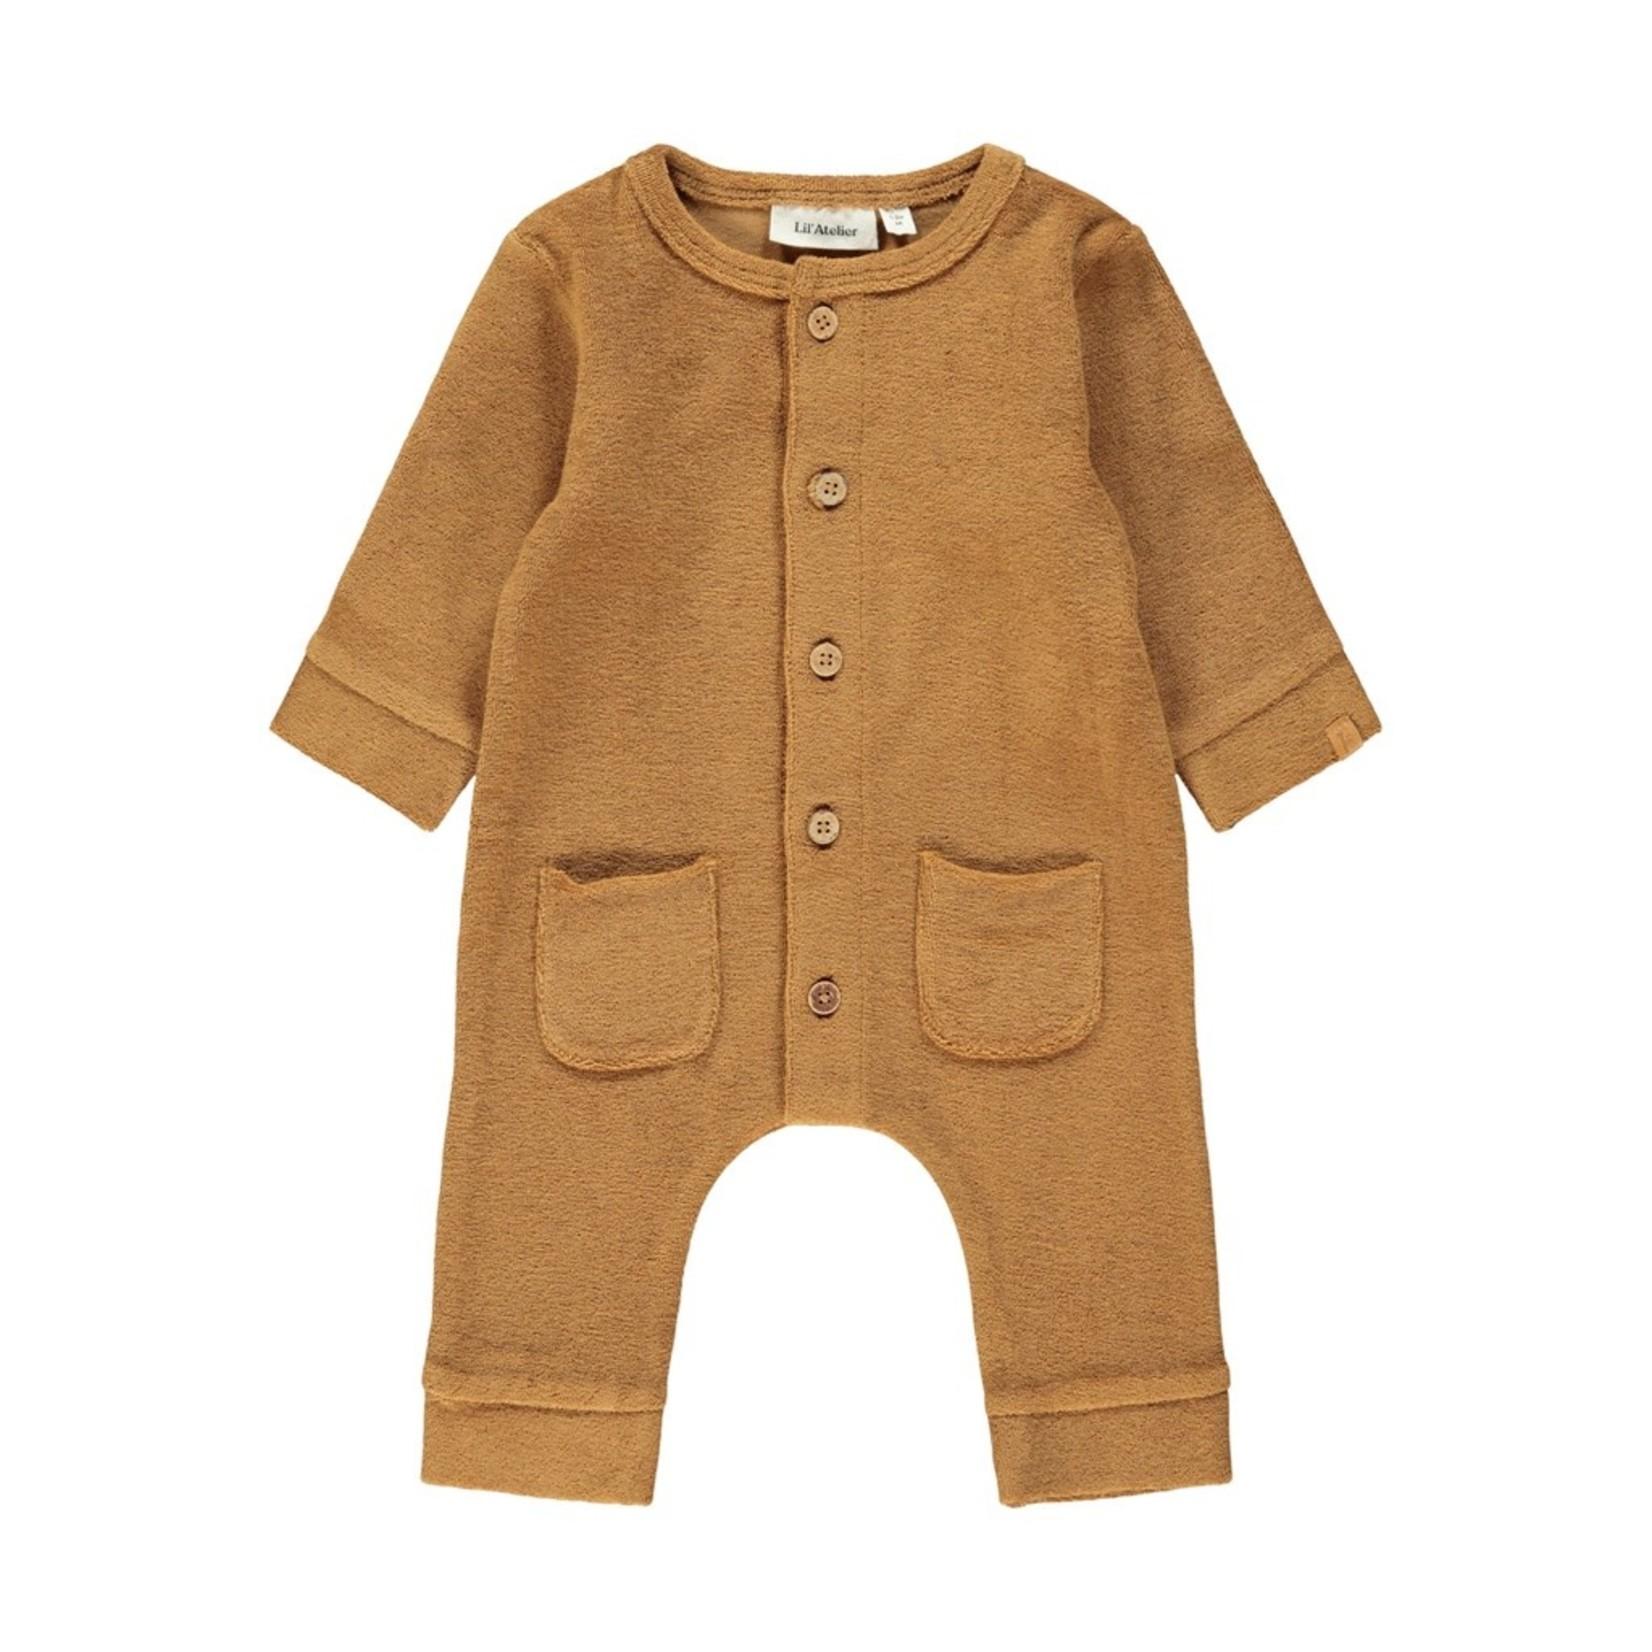 Lil Atelier Lil Atelier - Evald LS Sweat Suit Tobacco Brown